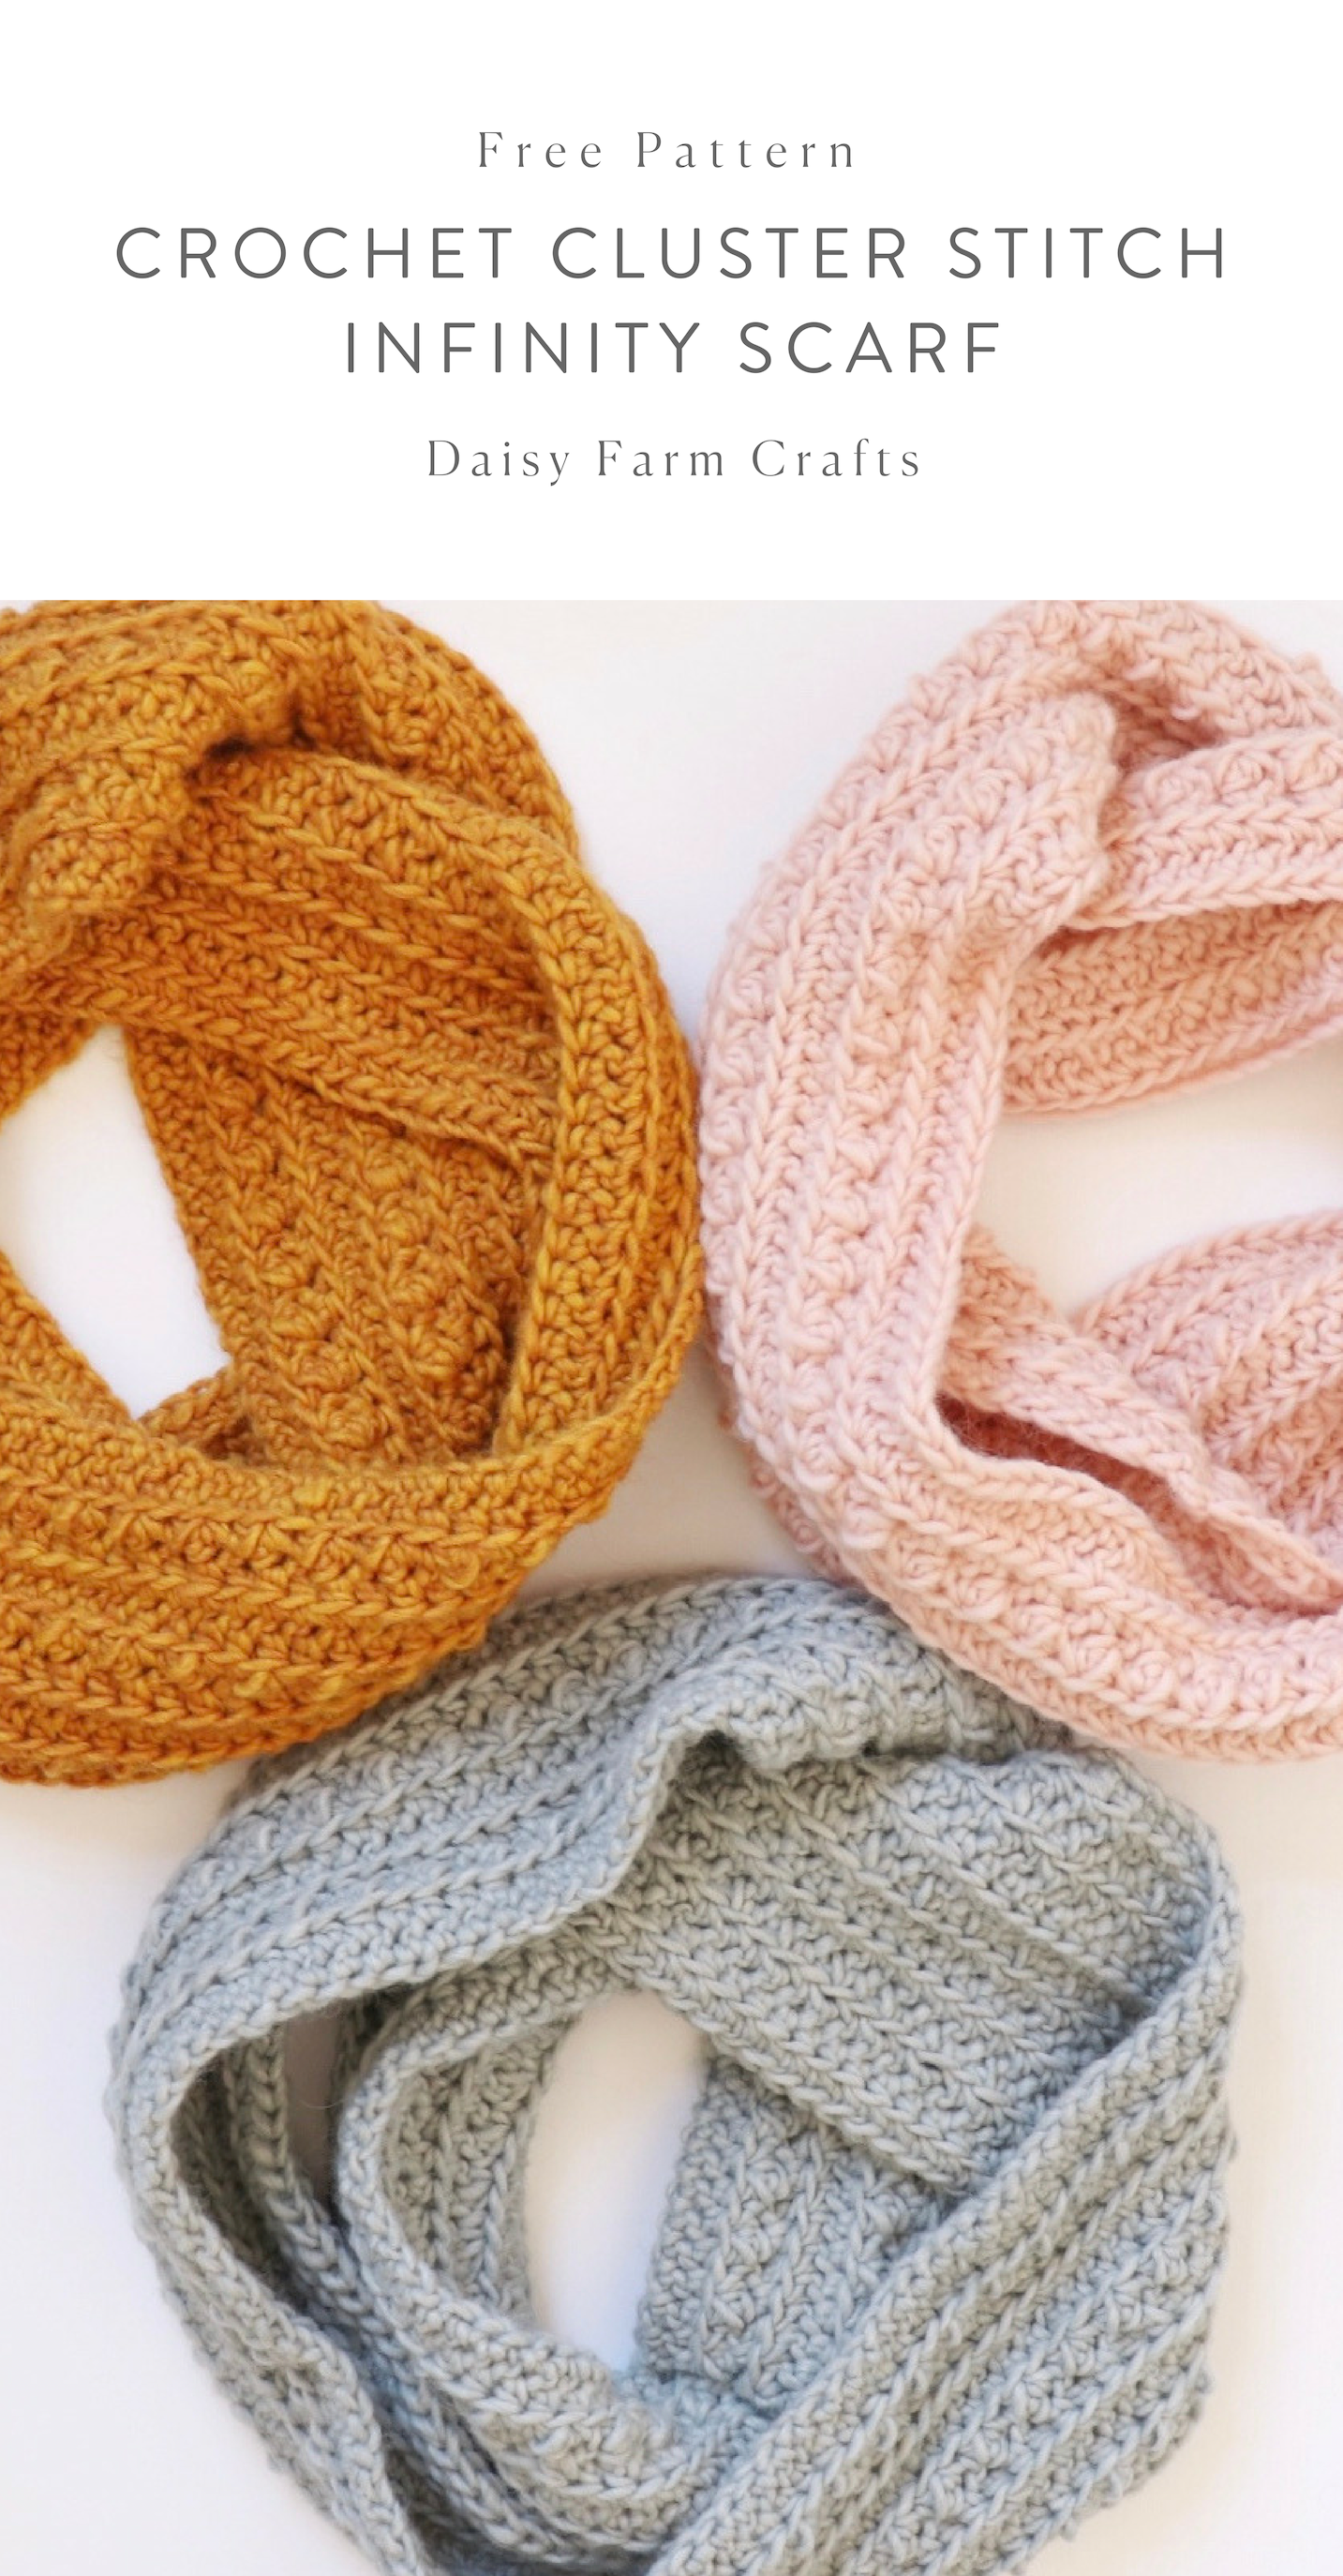 Free Pattern - Crochet Cluster Stitch Infinity Scarf #crochetscarves